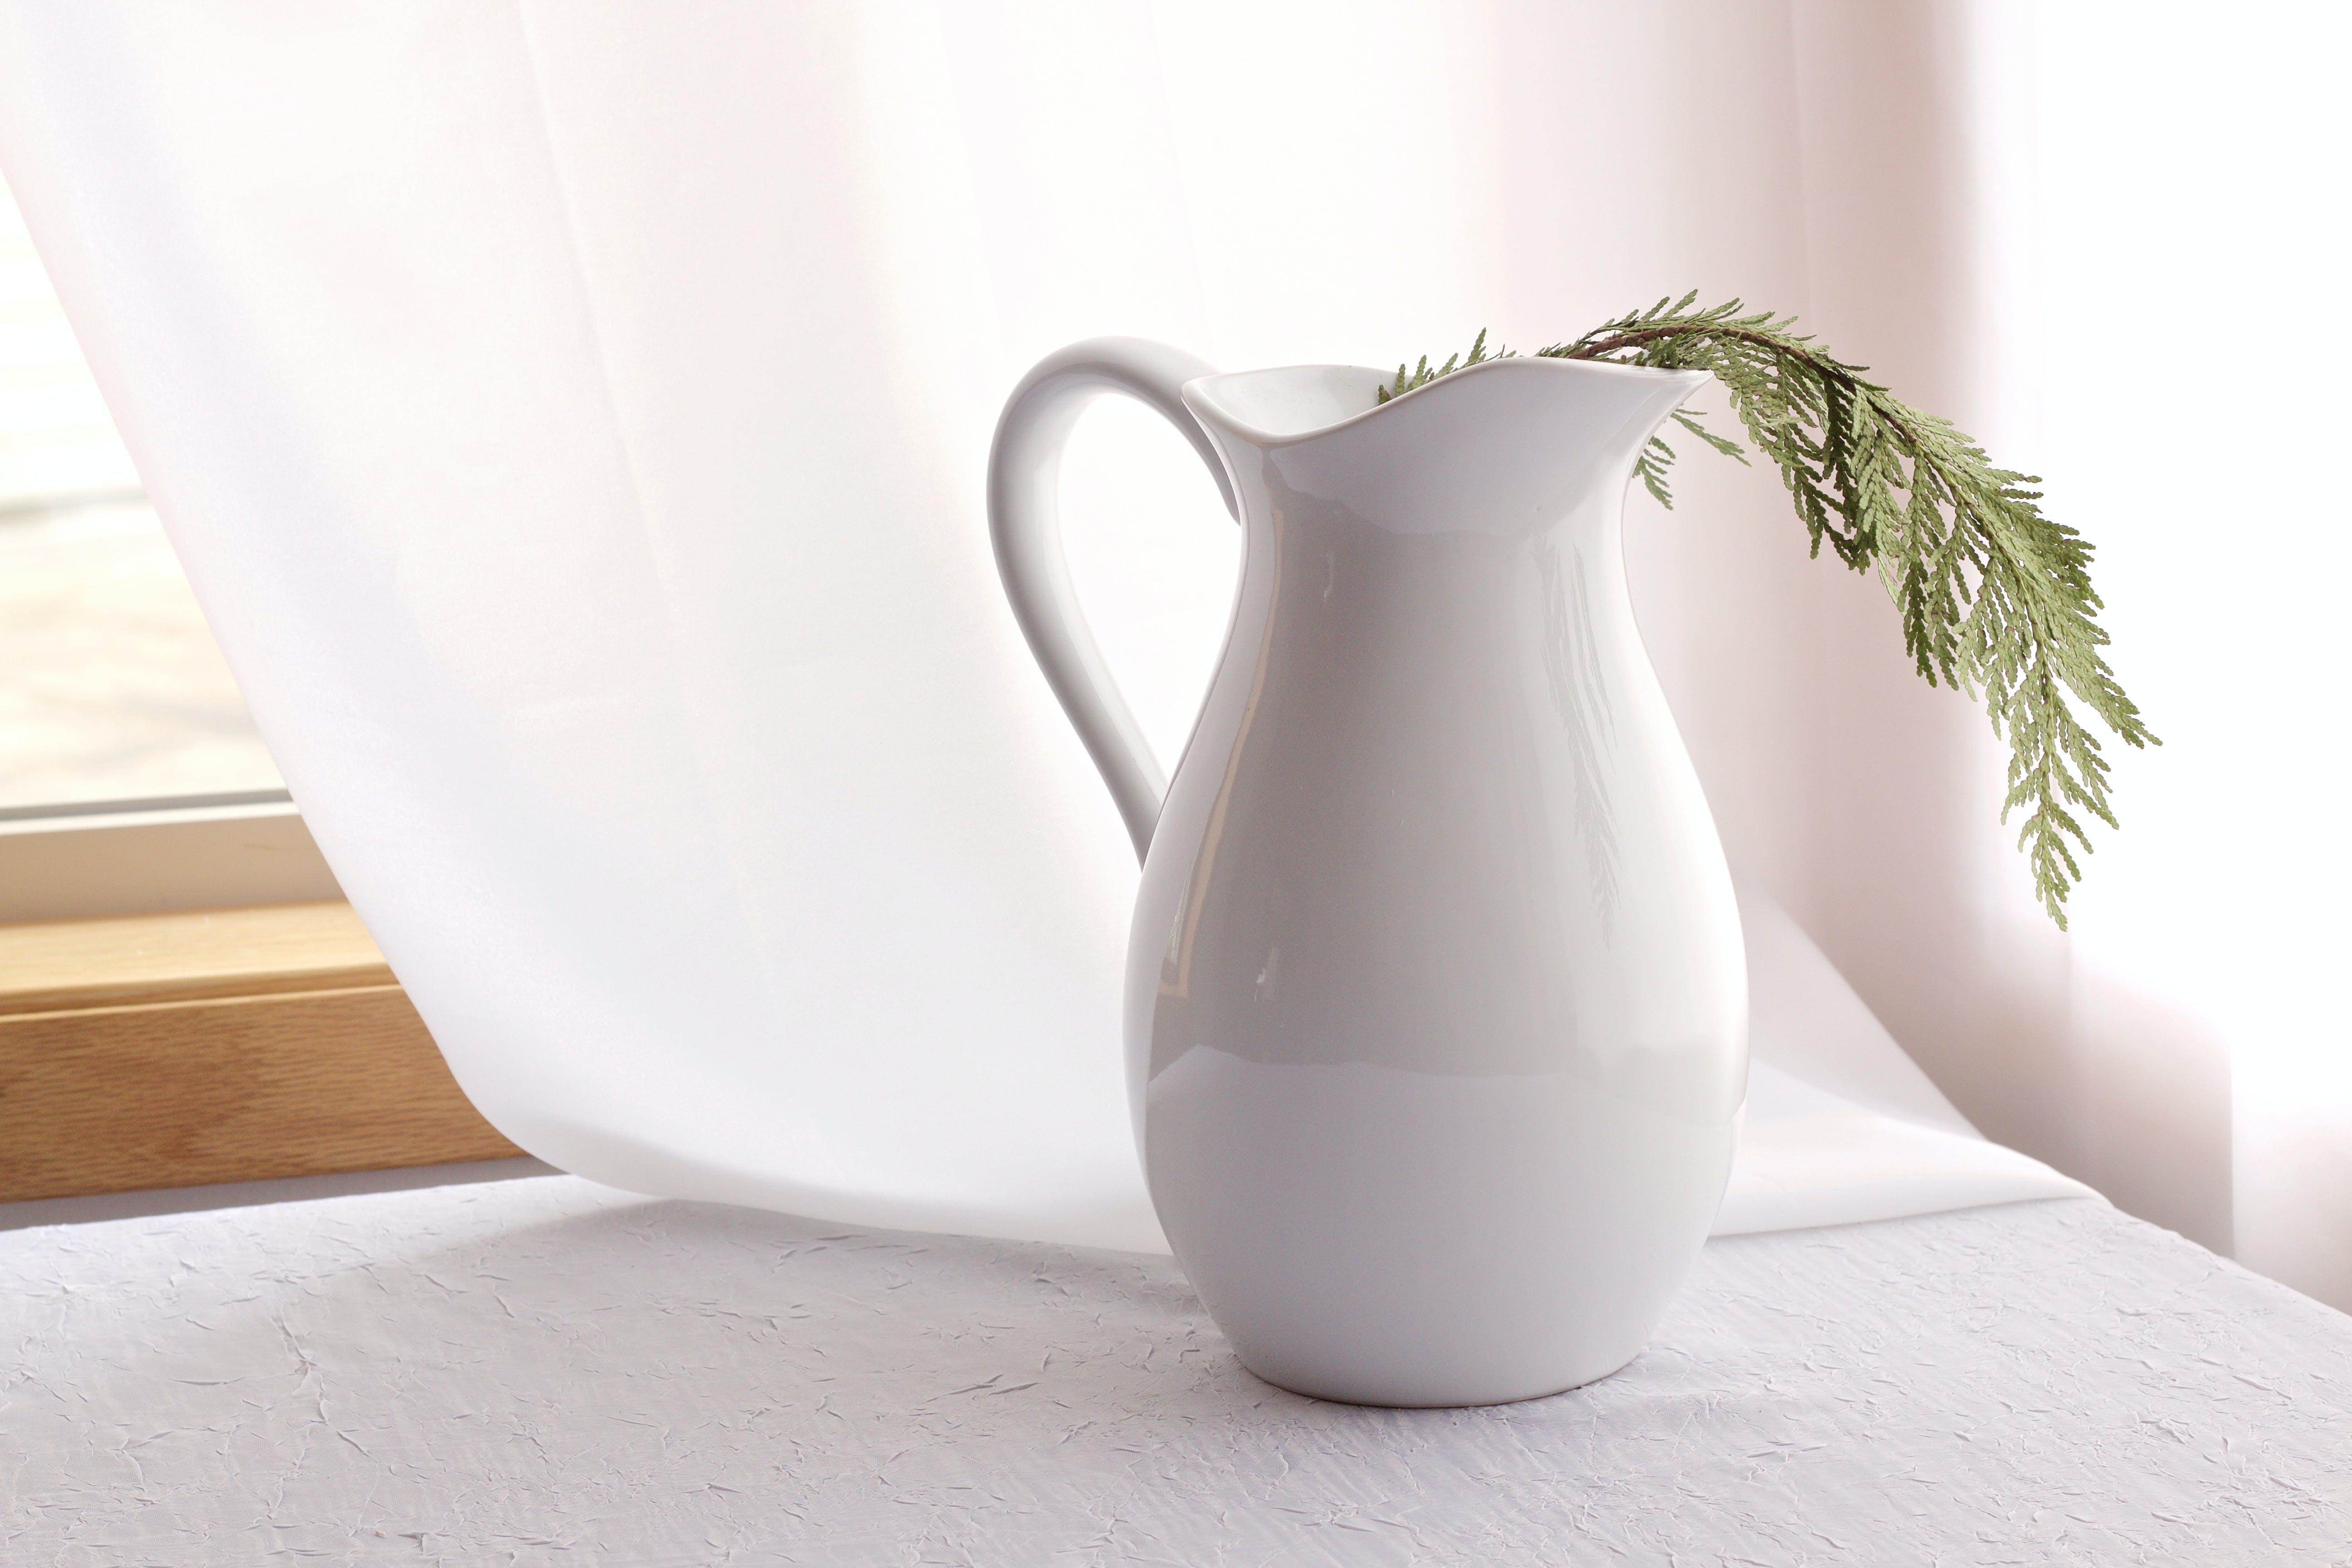 Free stock photo of light, pot, white, kitchen